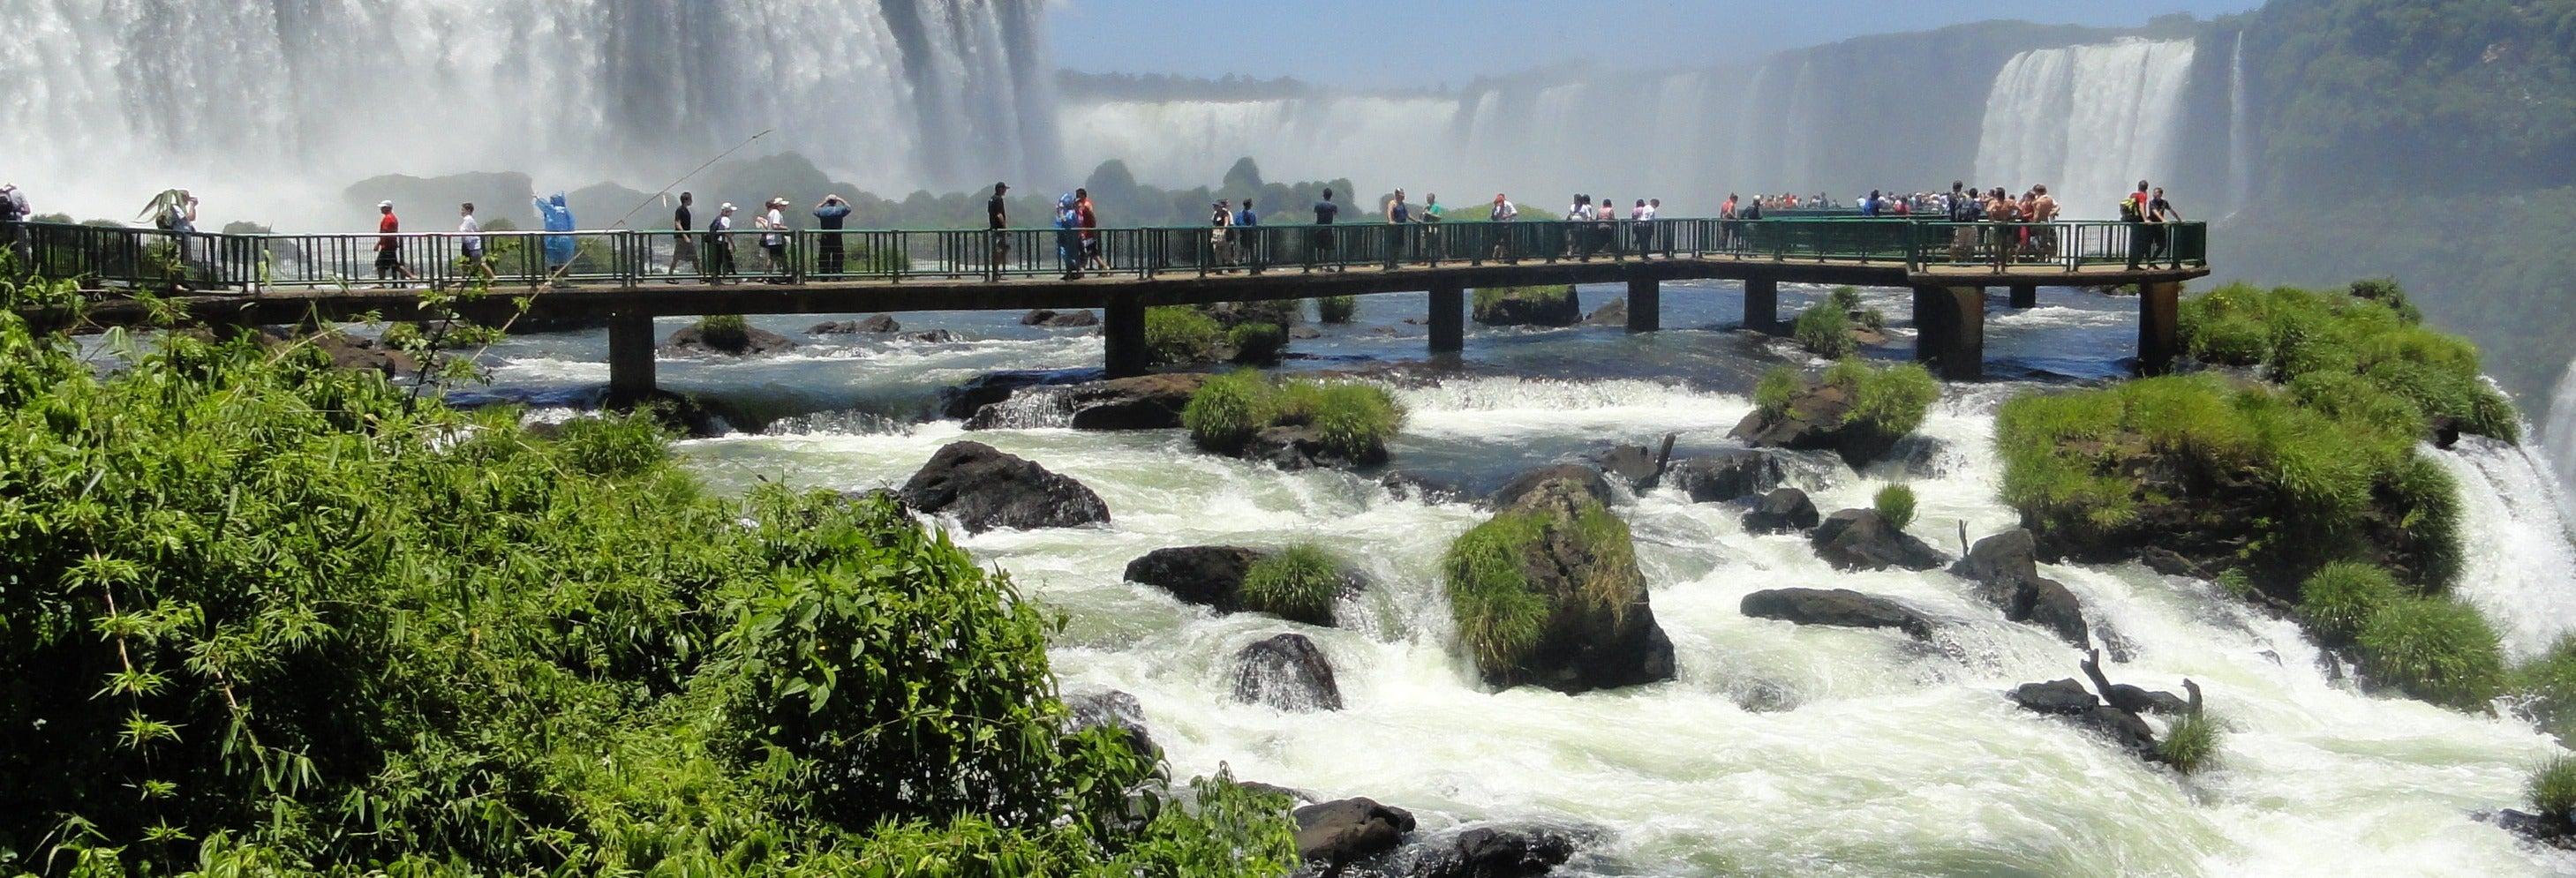 Tour en bicicleta por las Cataratas de Iguazú